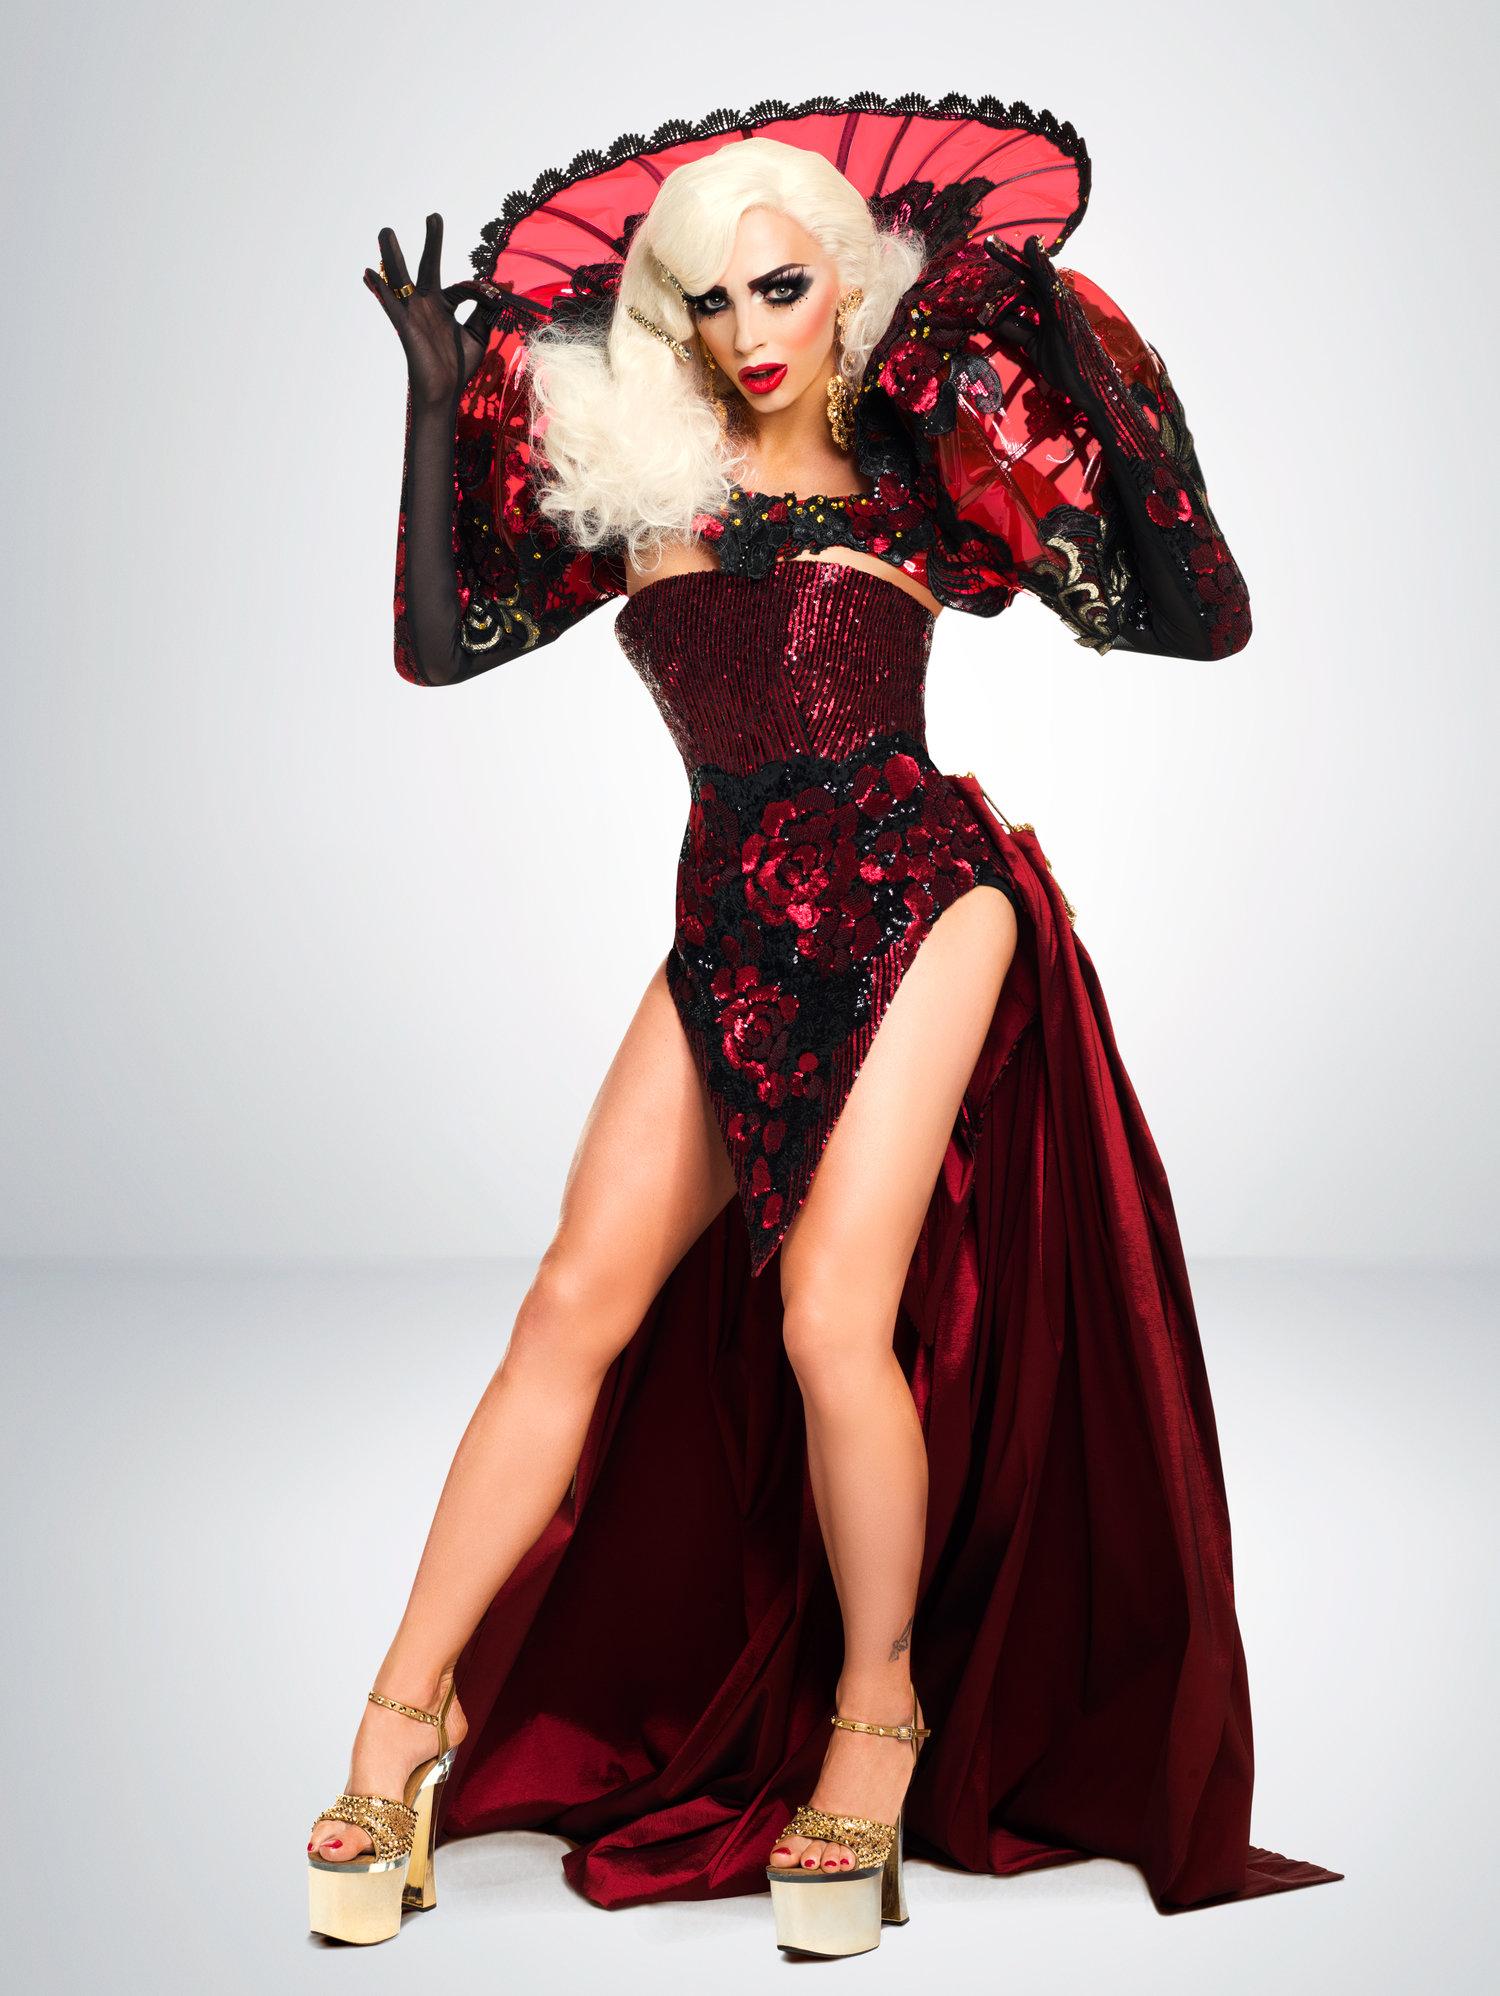 Alexis Texas Wikipedia alyssa edwards   rupaul's drag race wiki   fandom